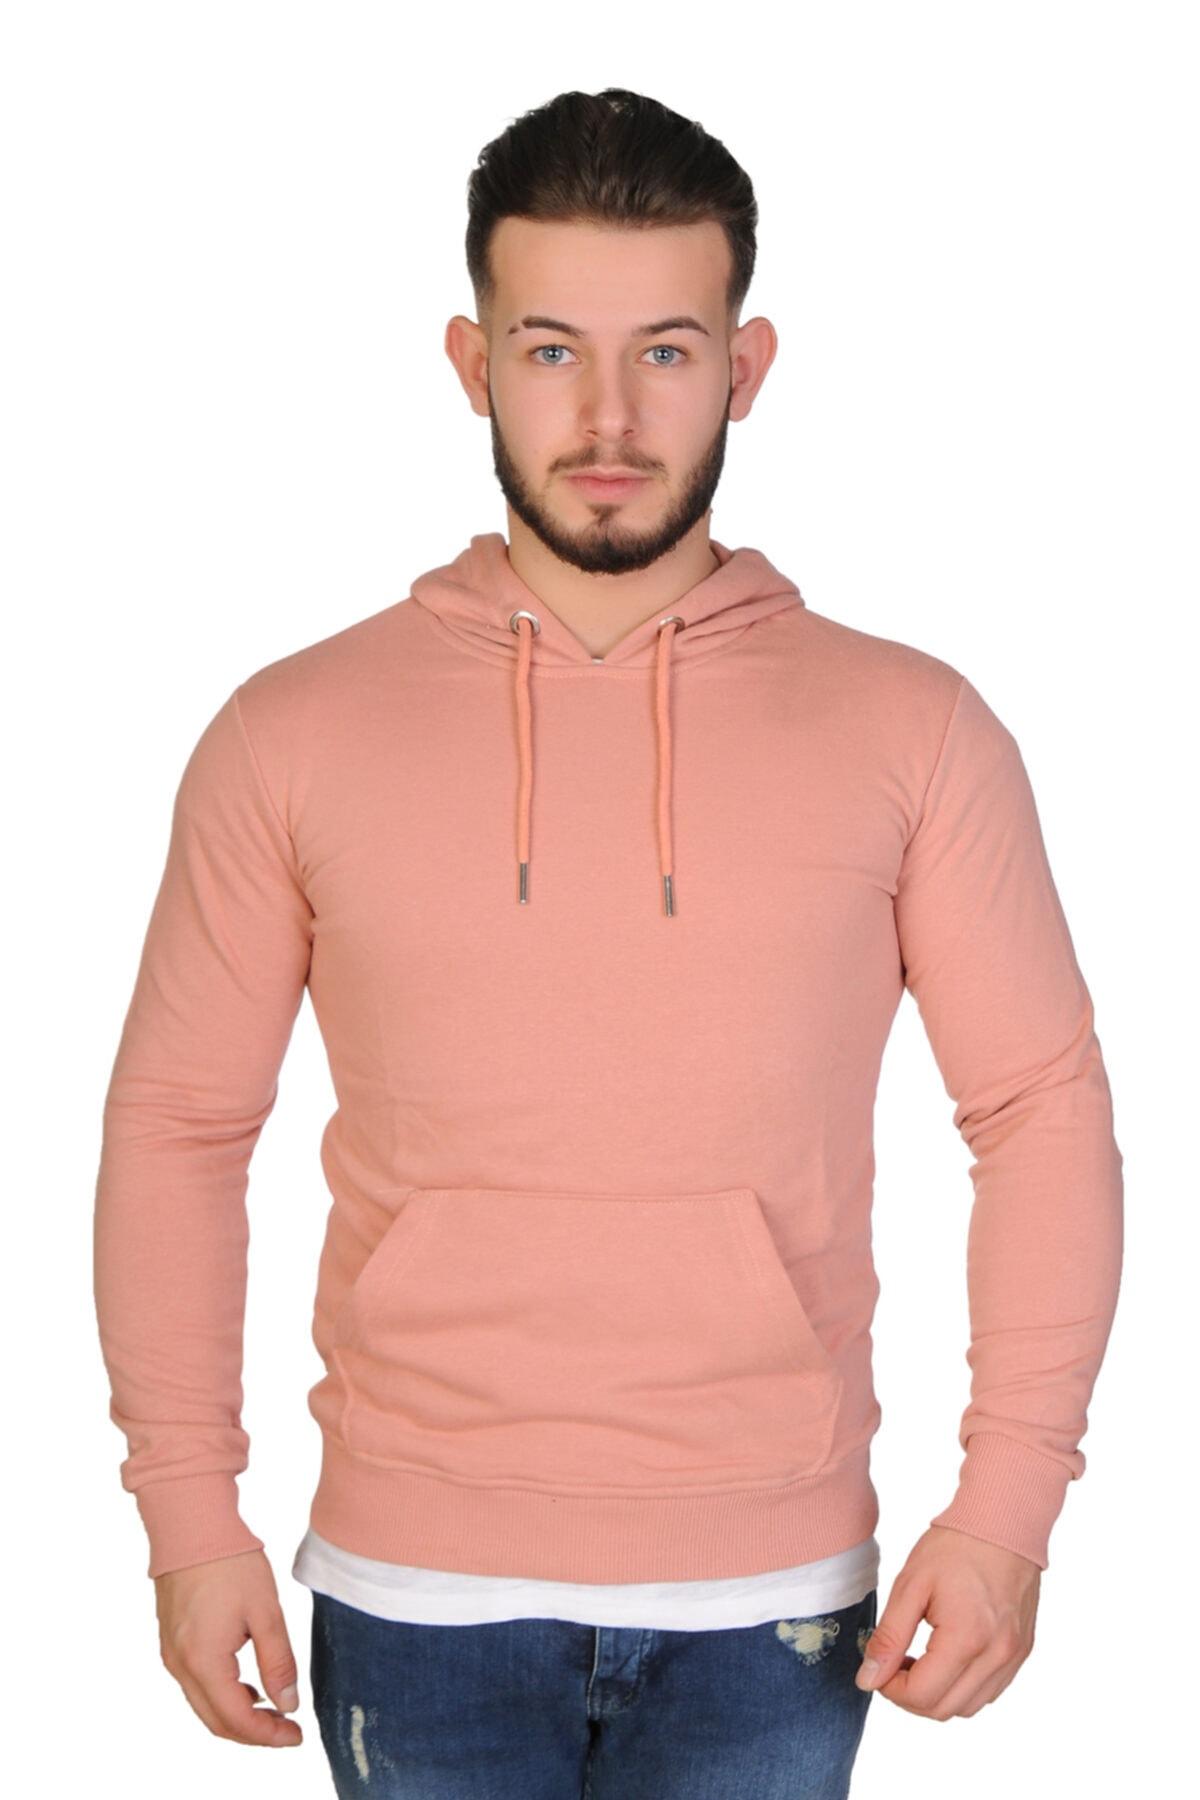 Baresse Collection Erkek Pudra Kapüşonlu Kanguru Cepli Sweatshirt 1